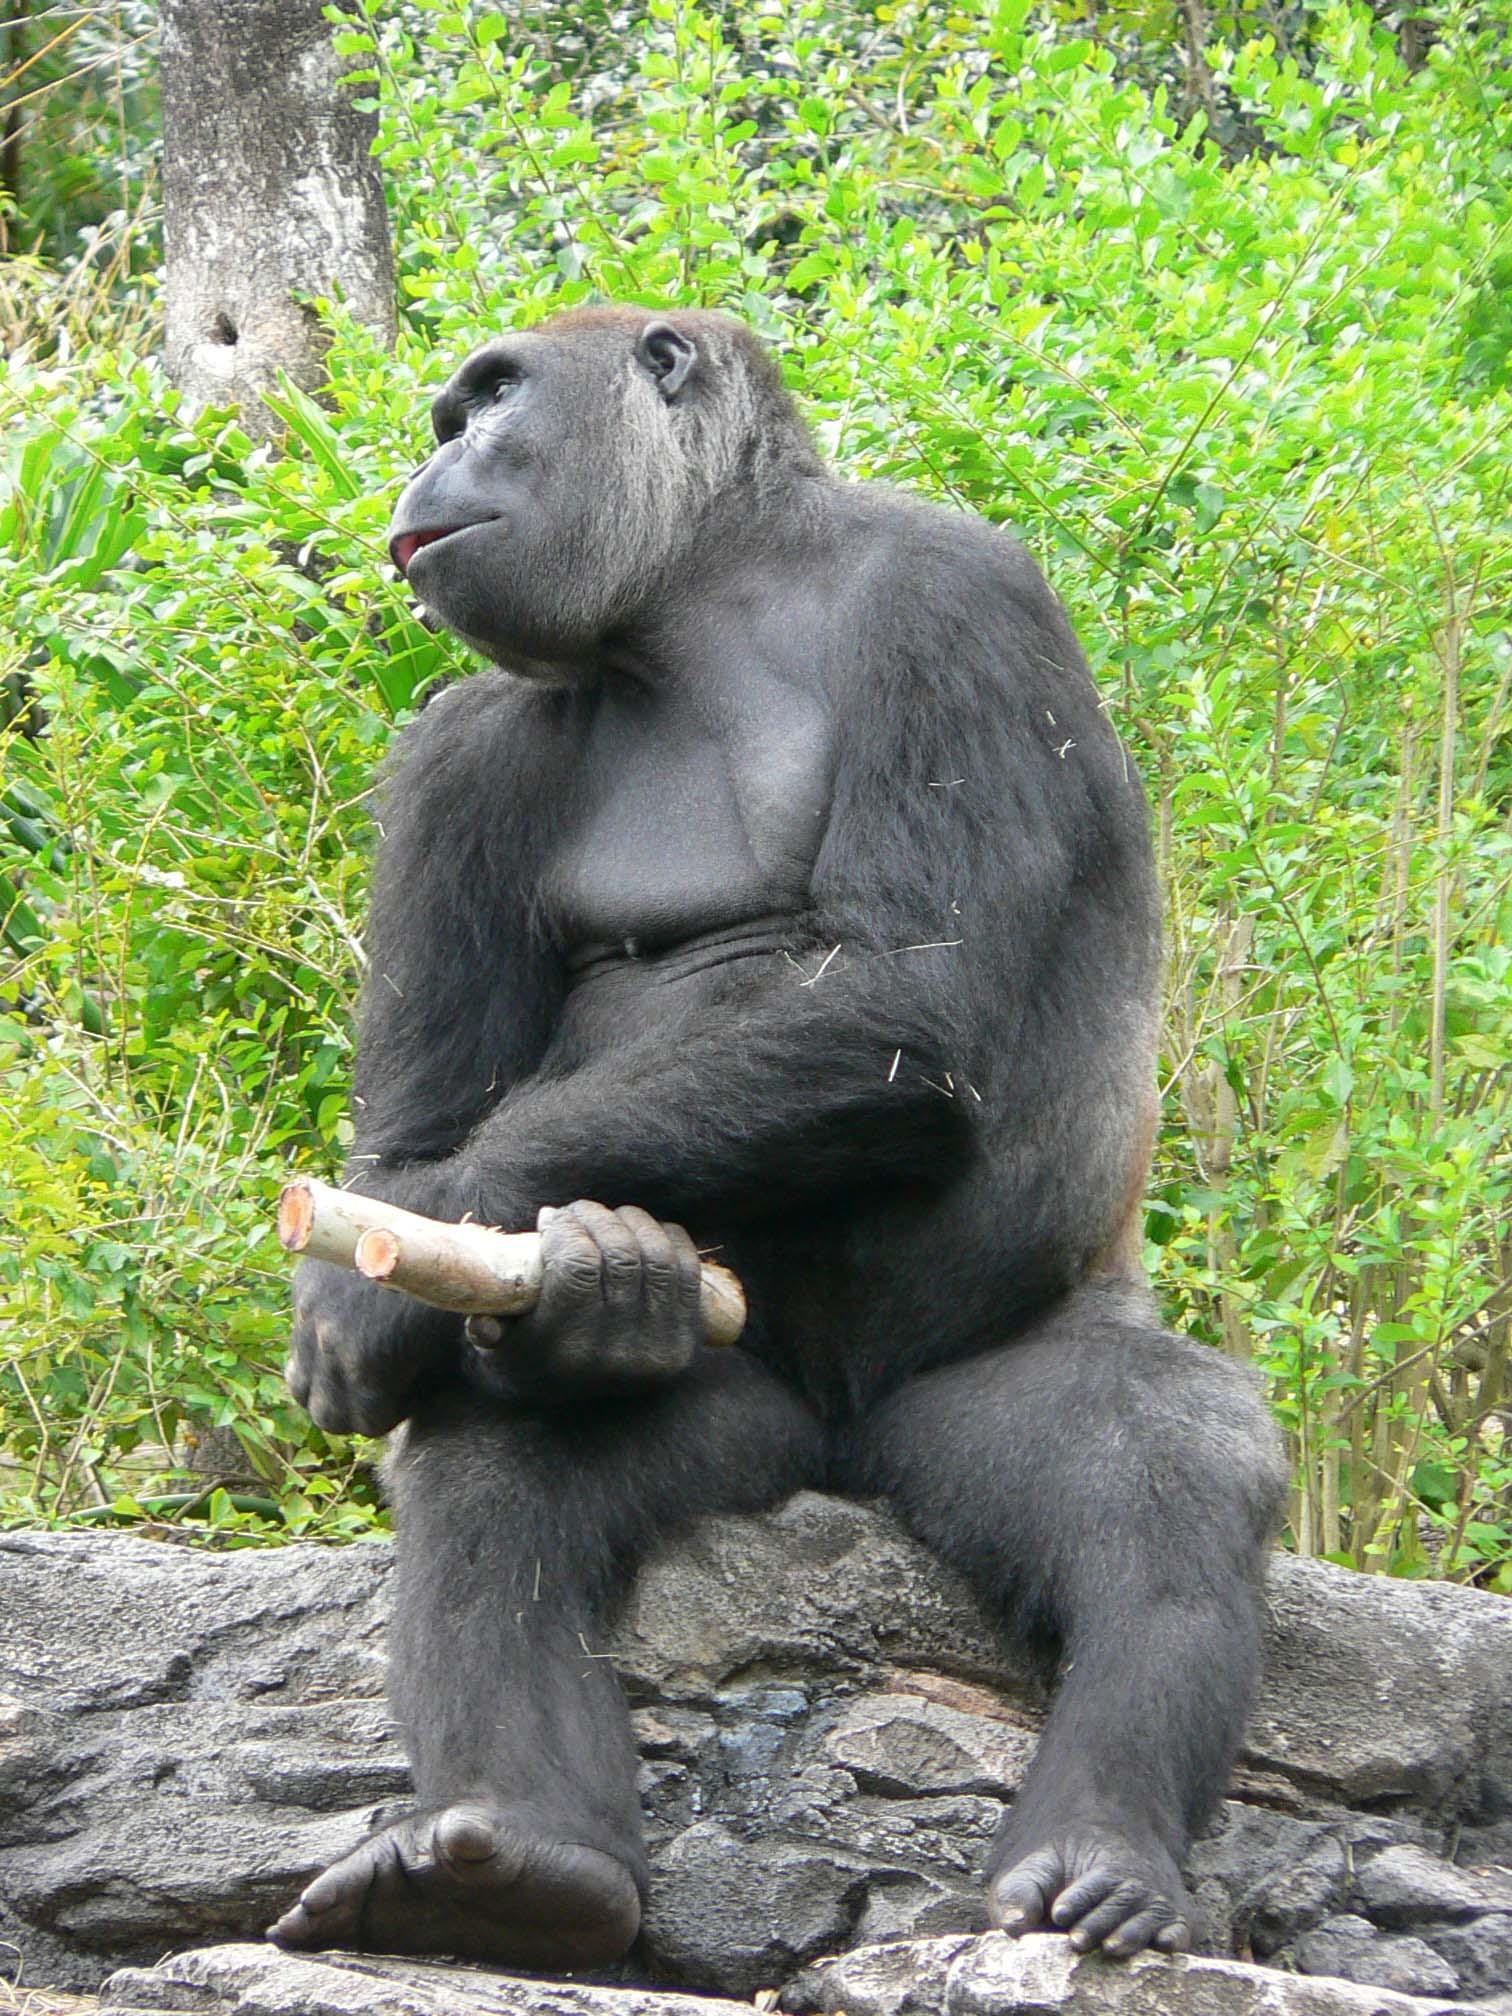 Free Ape Sex Videos gorilla big dick and girl fuck videos watch . hot porno.